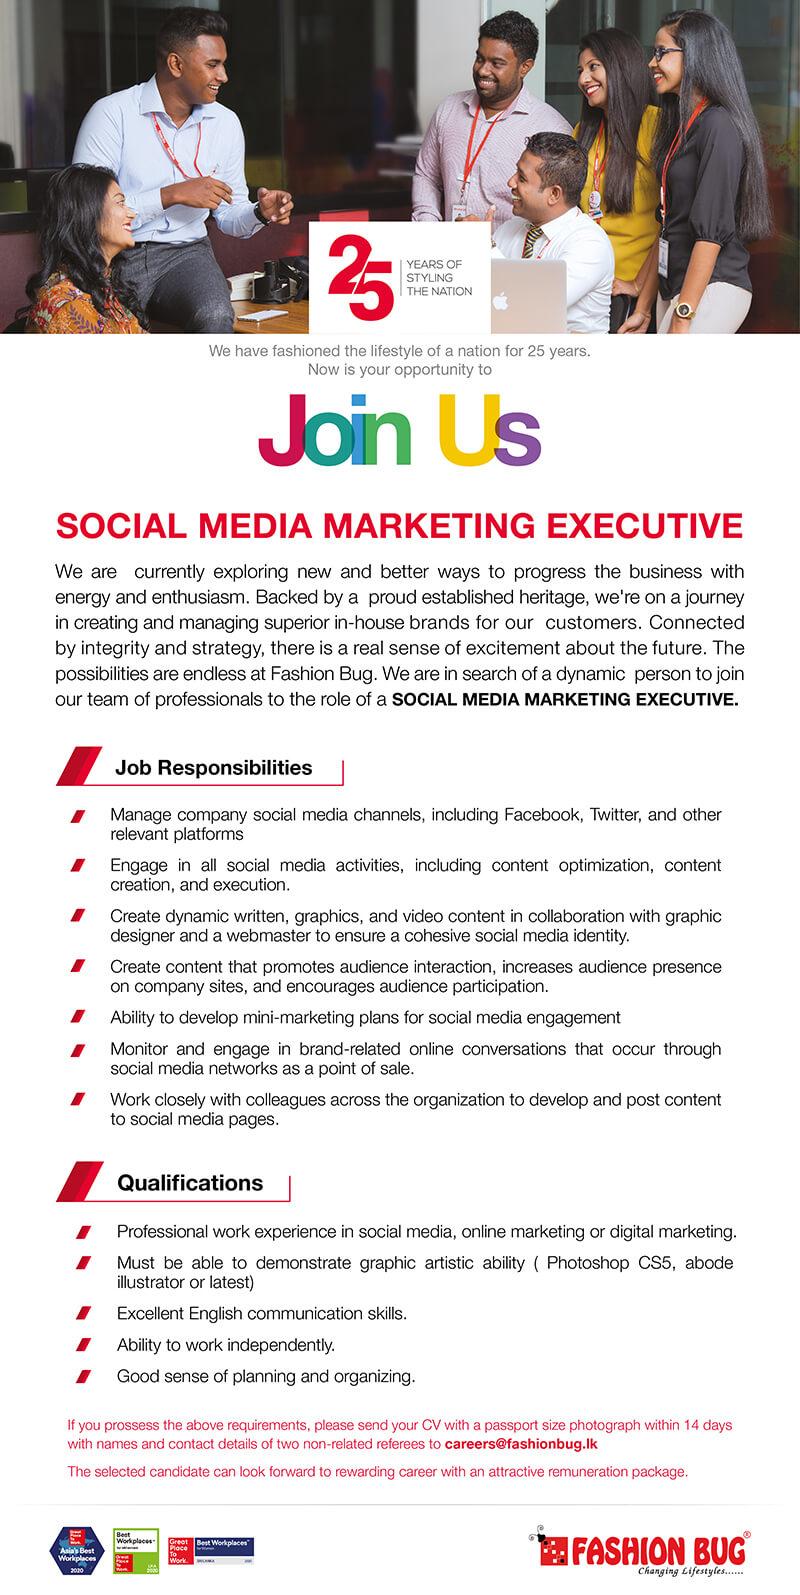 SOCIAL-MEDIA-MARKETING-EXECUTIVE